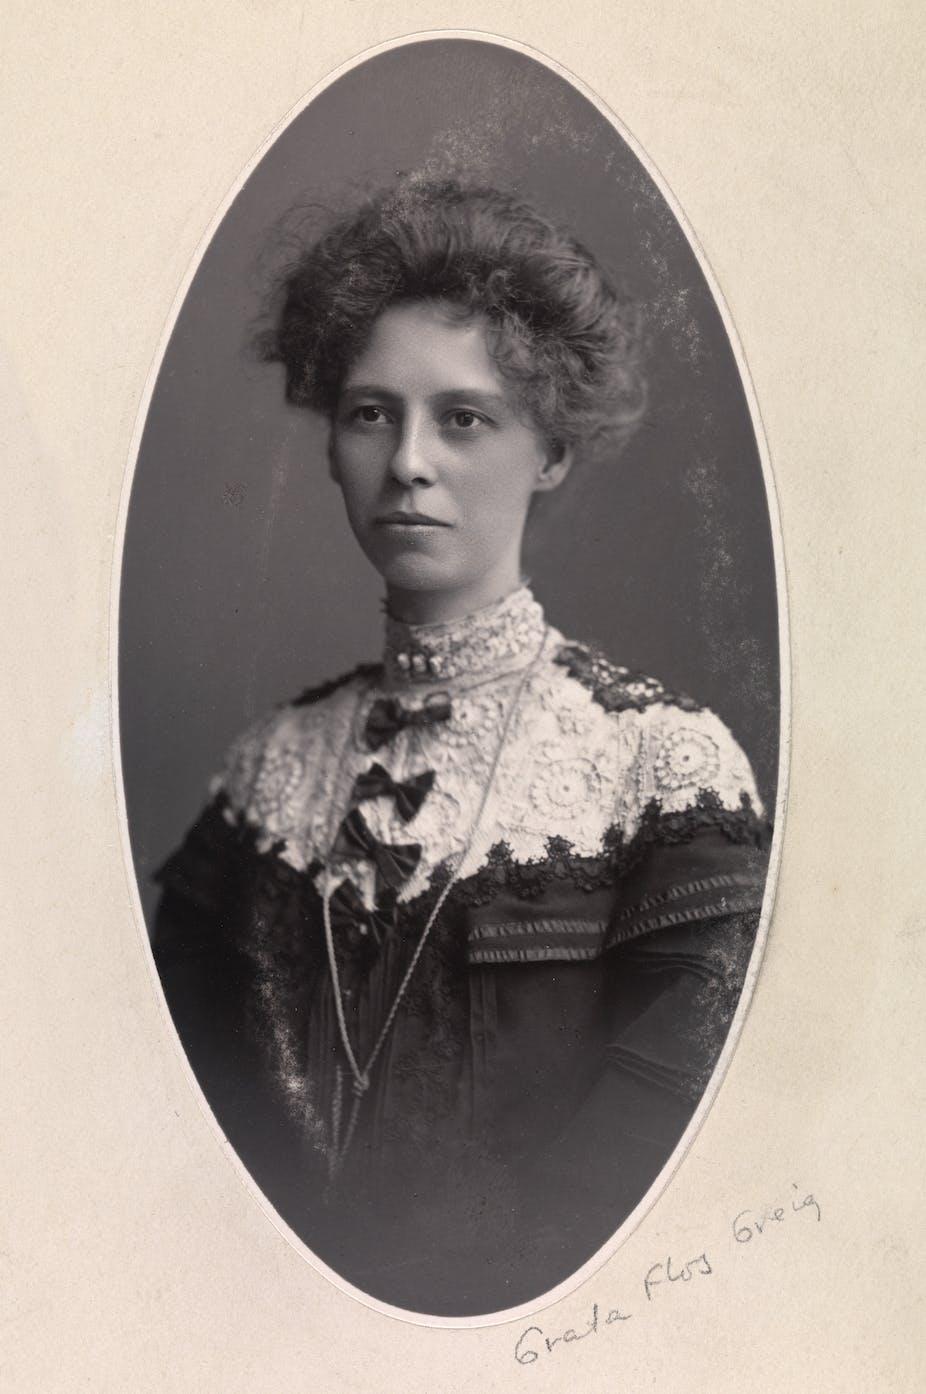 Hidden women of history: Flos Greig, Australia's first female ...